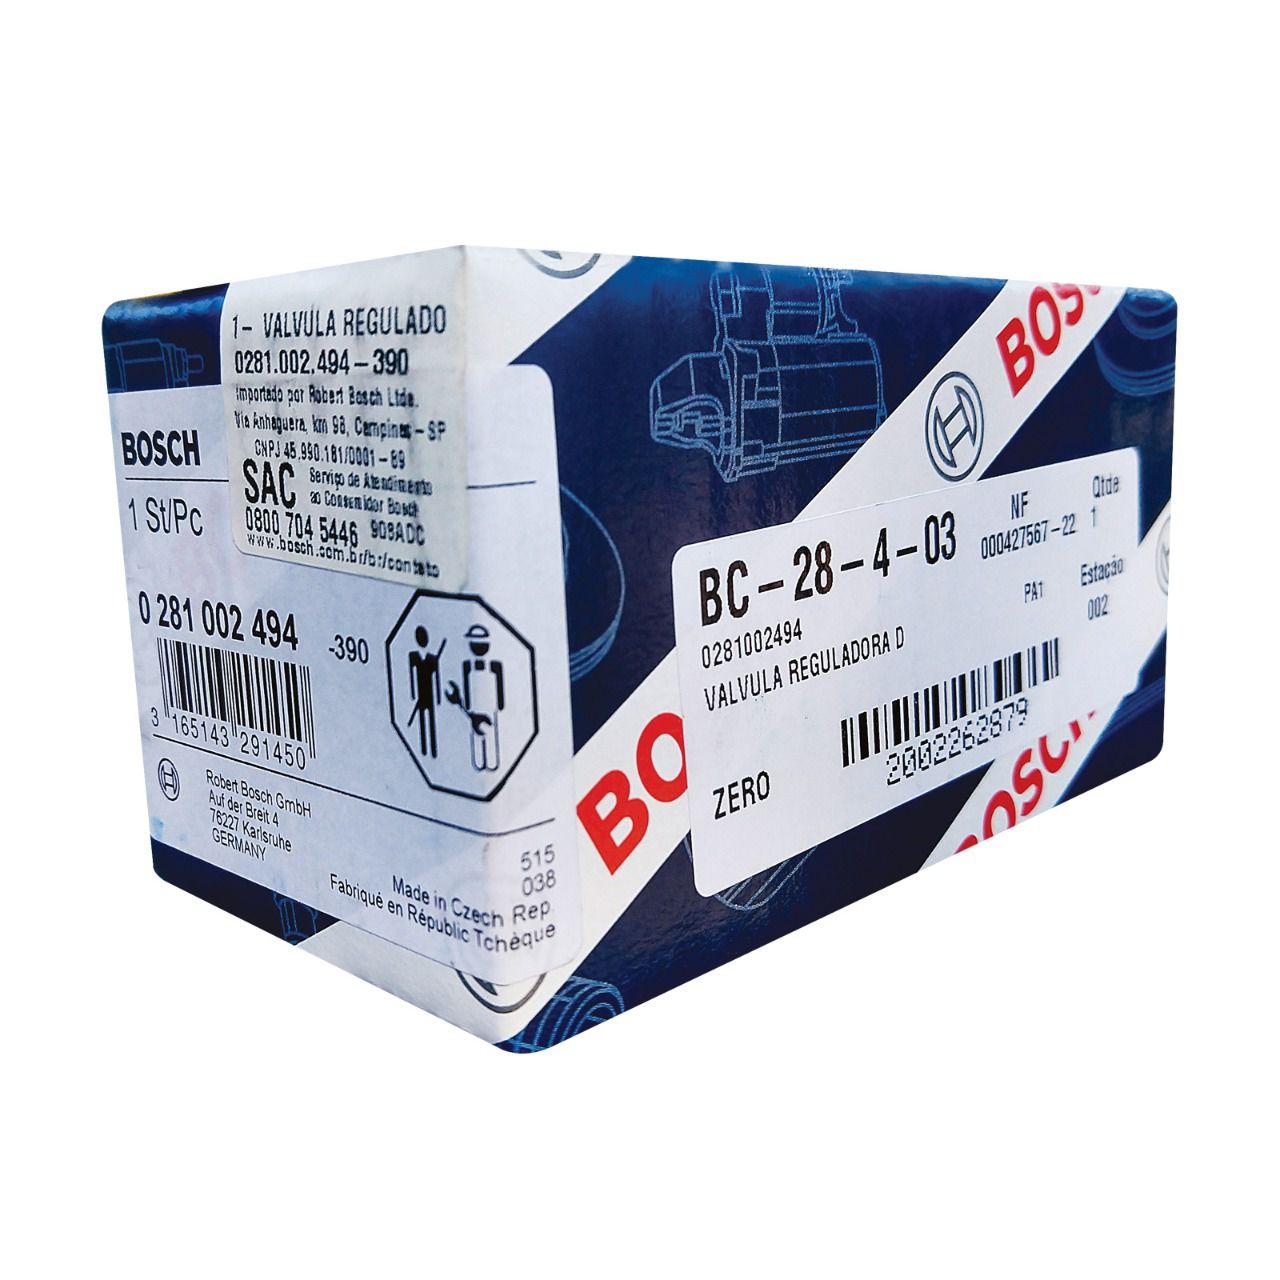 Válvula Reguladora da Flauta  ML 350 CDI 4MATIC / ML 320 CDI CDI 4MATIC  e Grand Cherokee 3.0 CRD 0281002494